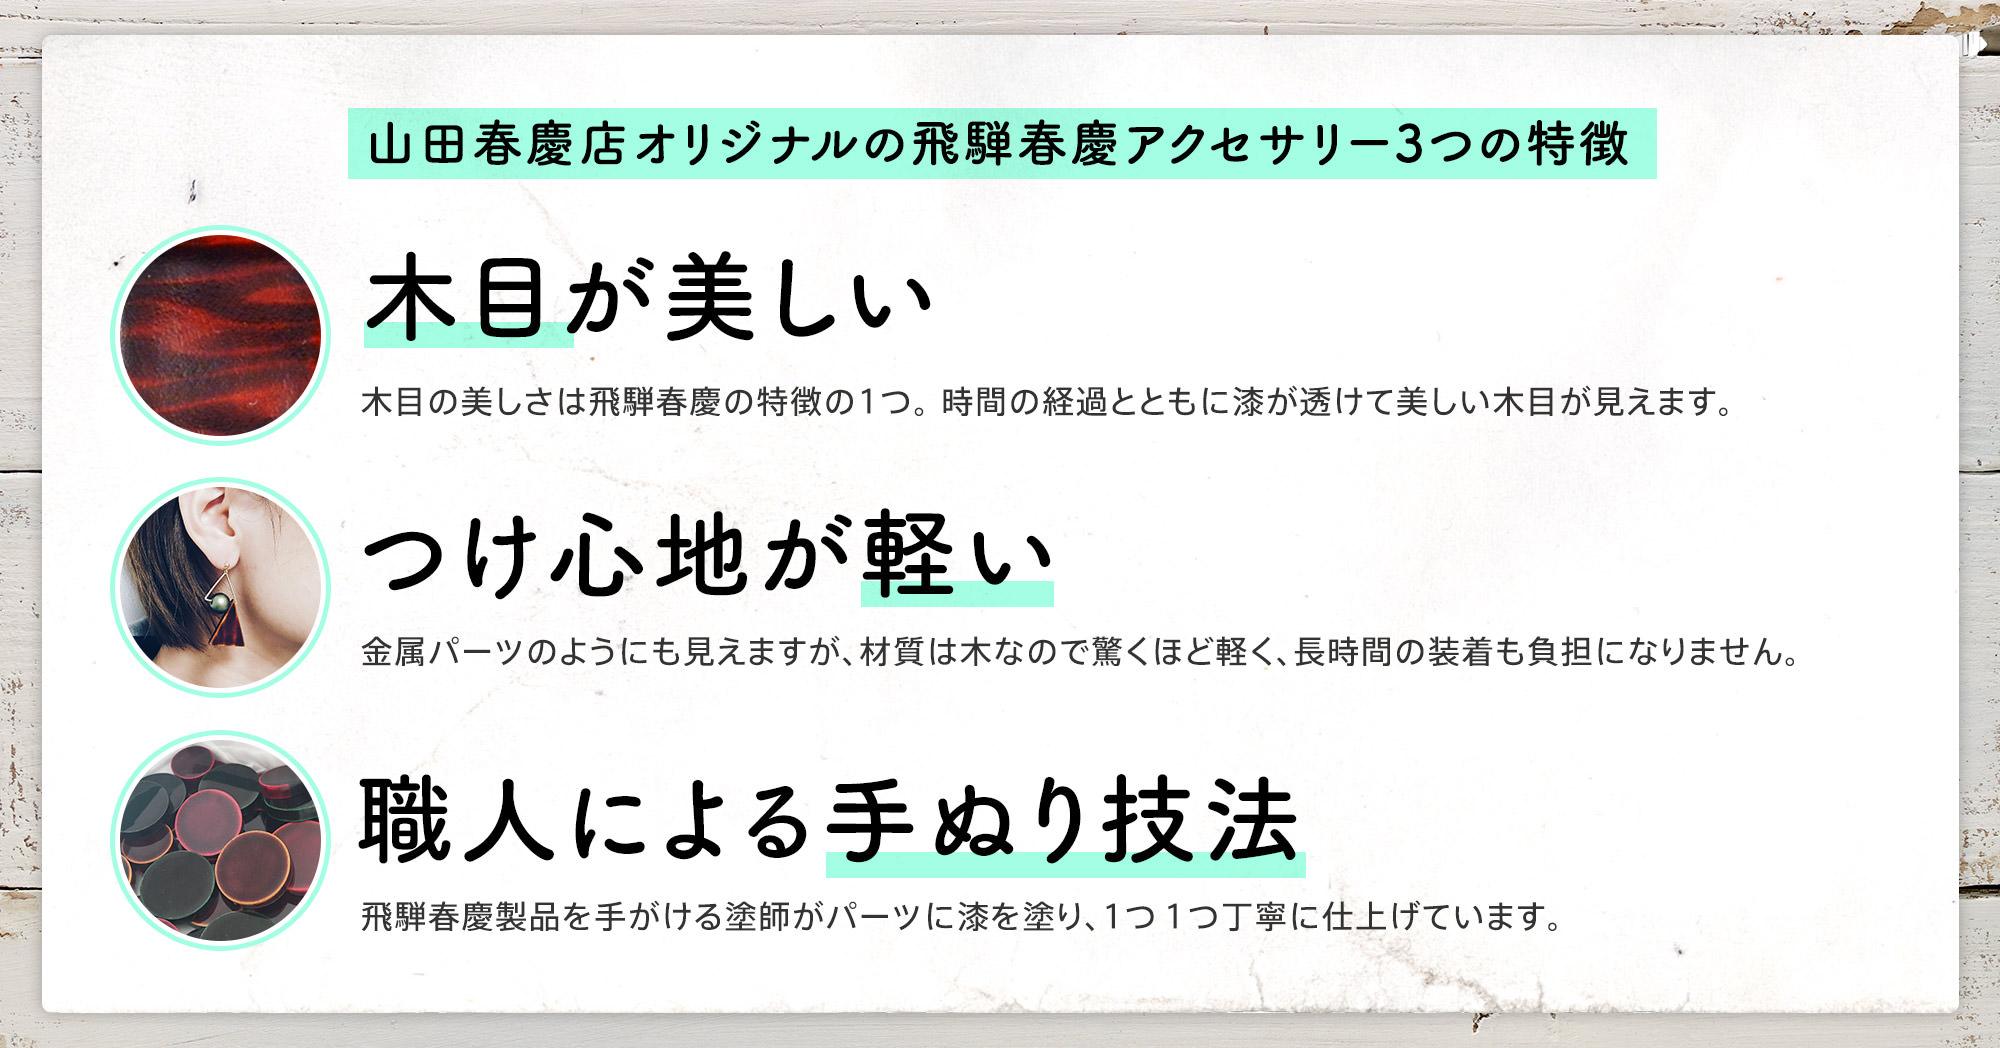 飛騨春慶塗 工芸品アクセサリー - 山田春慶店紹介画像2